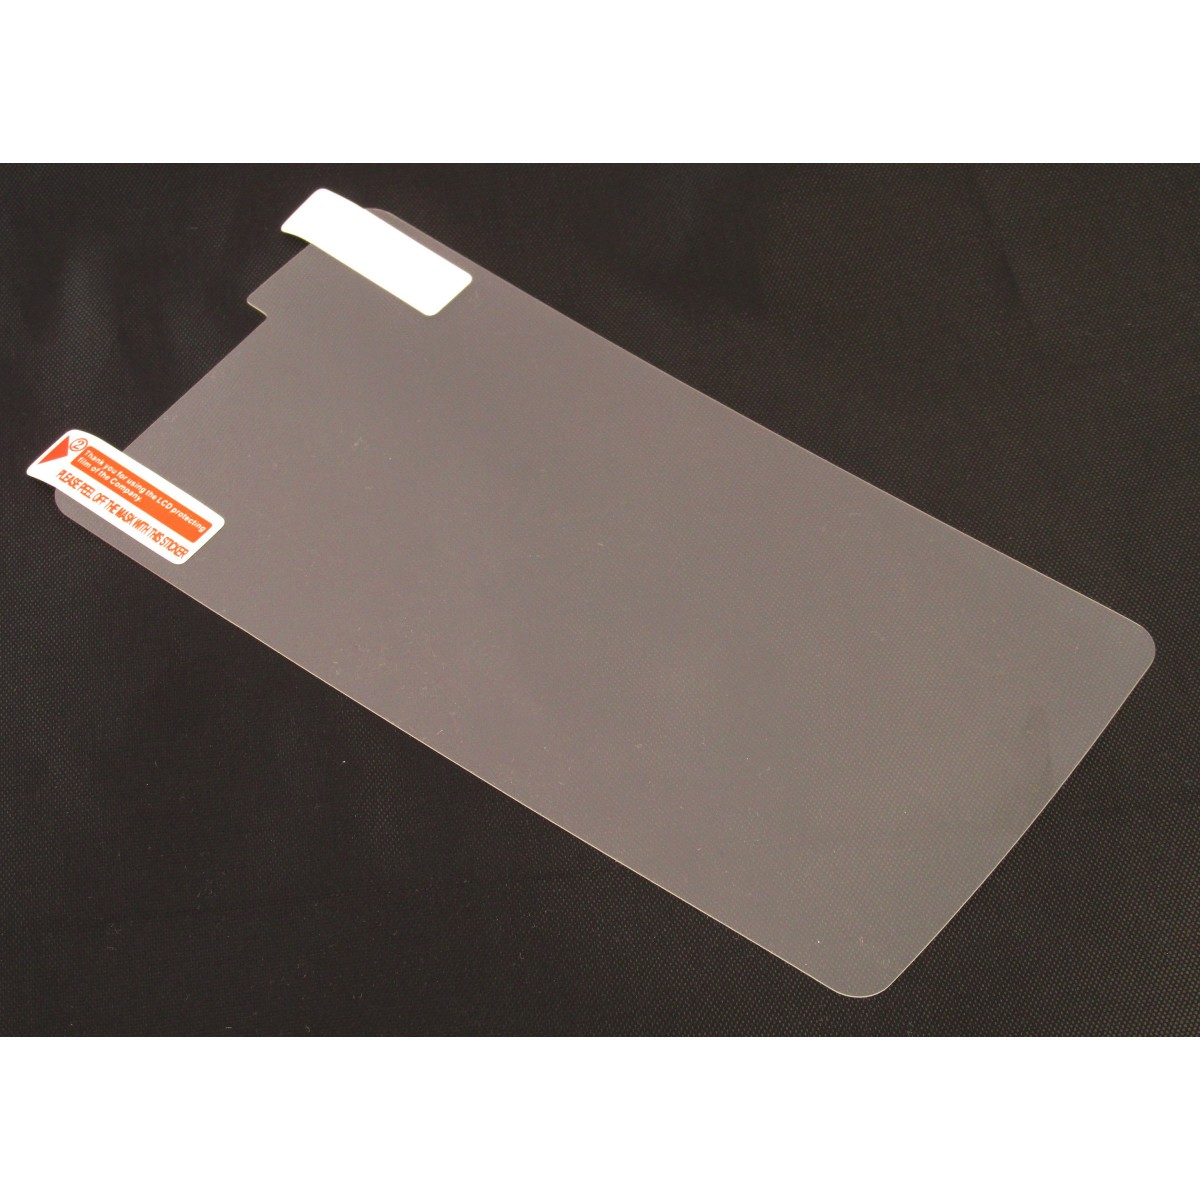 Pelicula Protetora para LG G3 D850 D855 Fosca